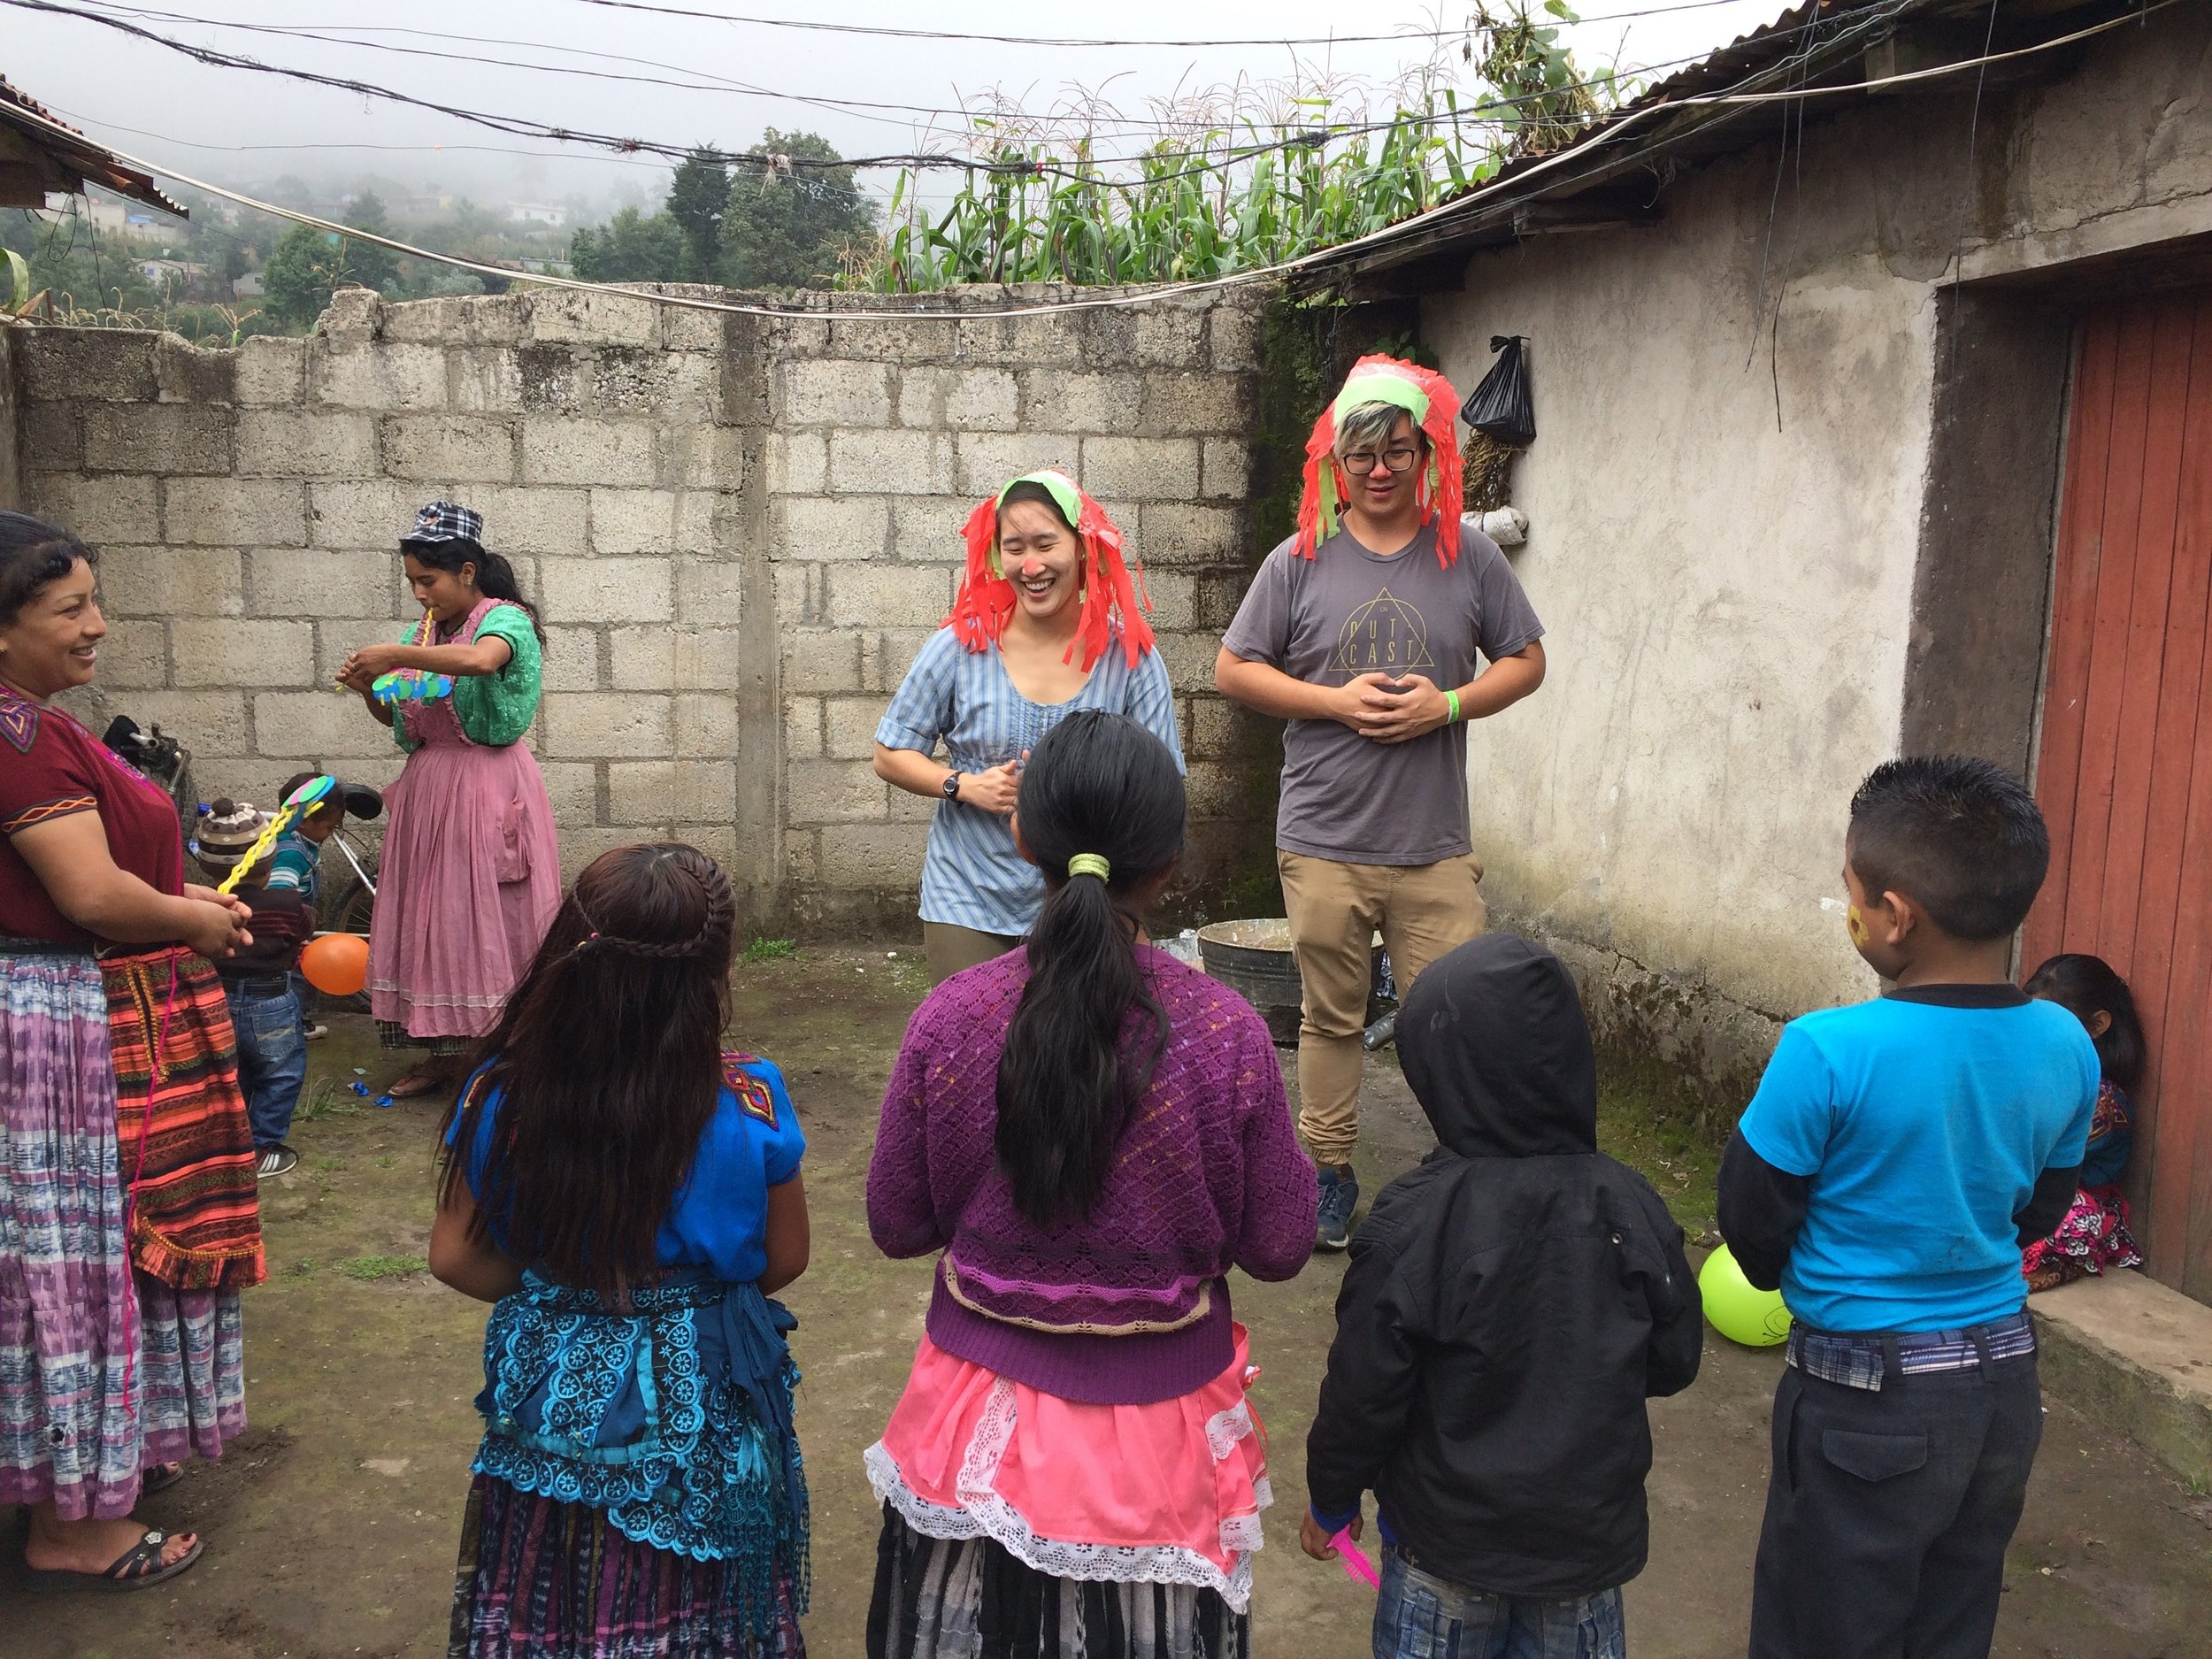 Joyce helping out Primeros Pasos with a celebration for Día Mundial de Alimentacion (World Food Day)